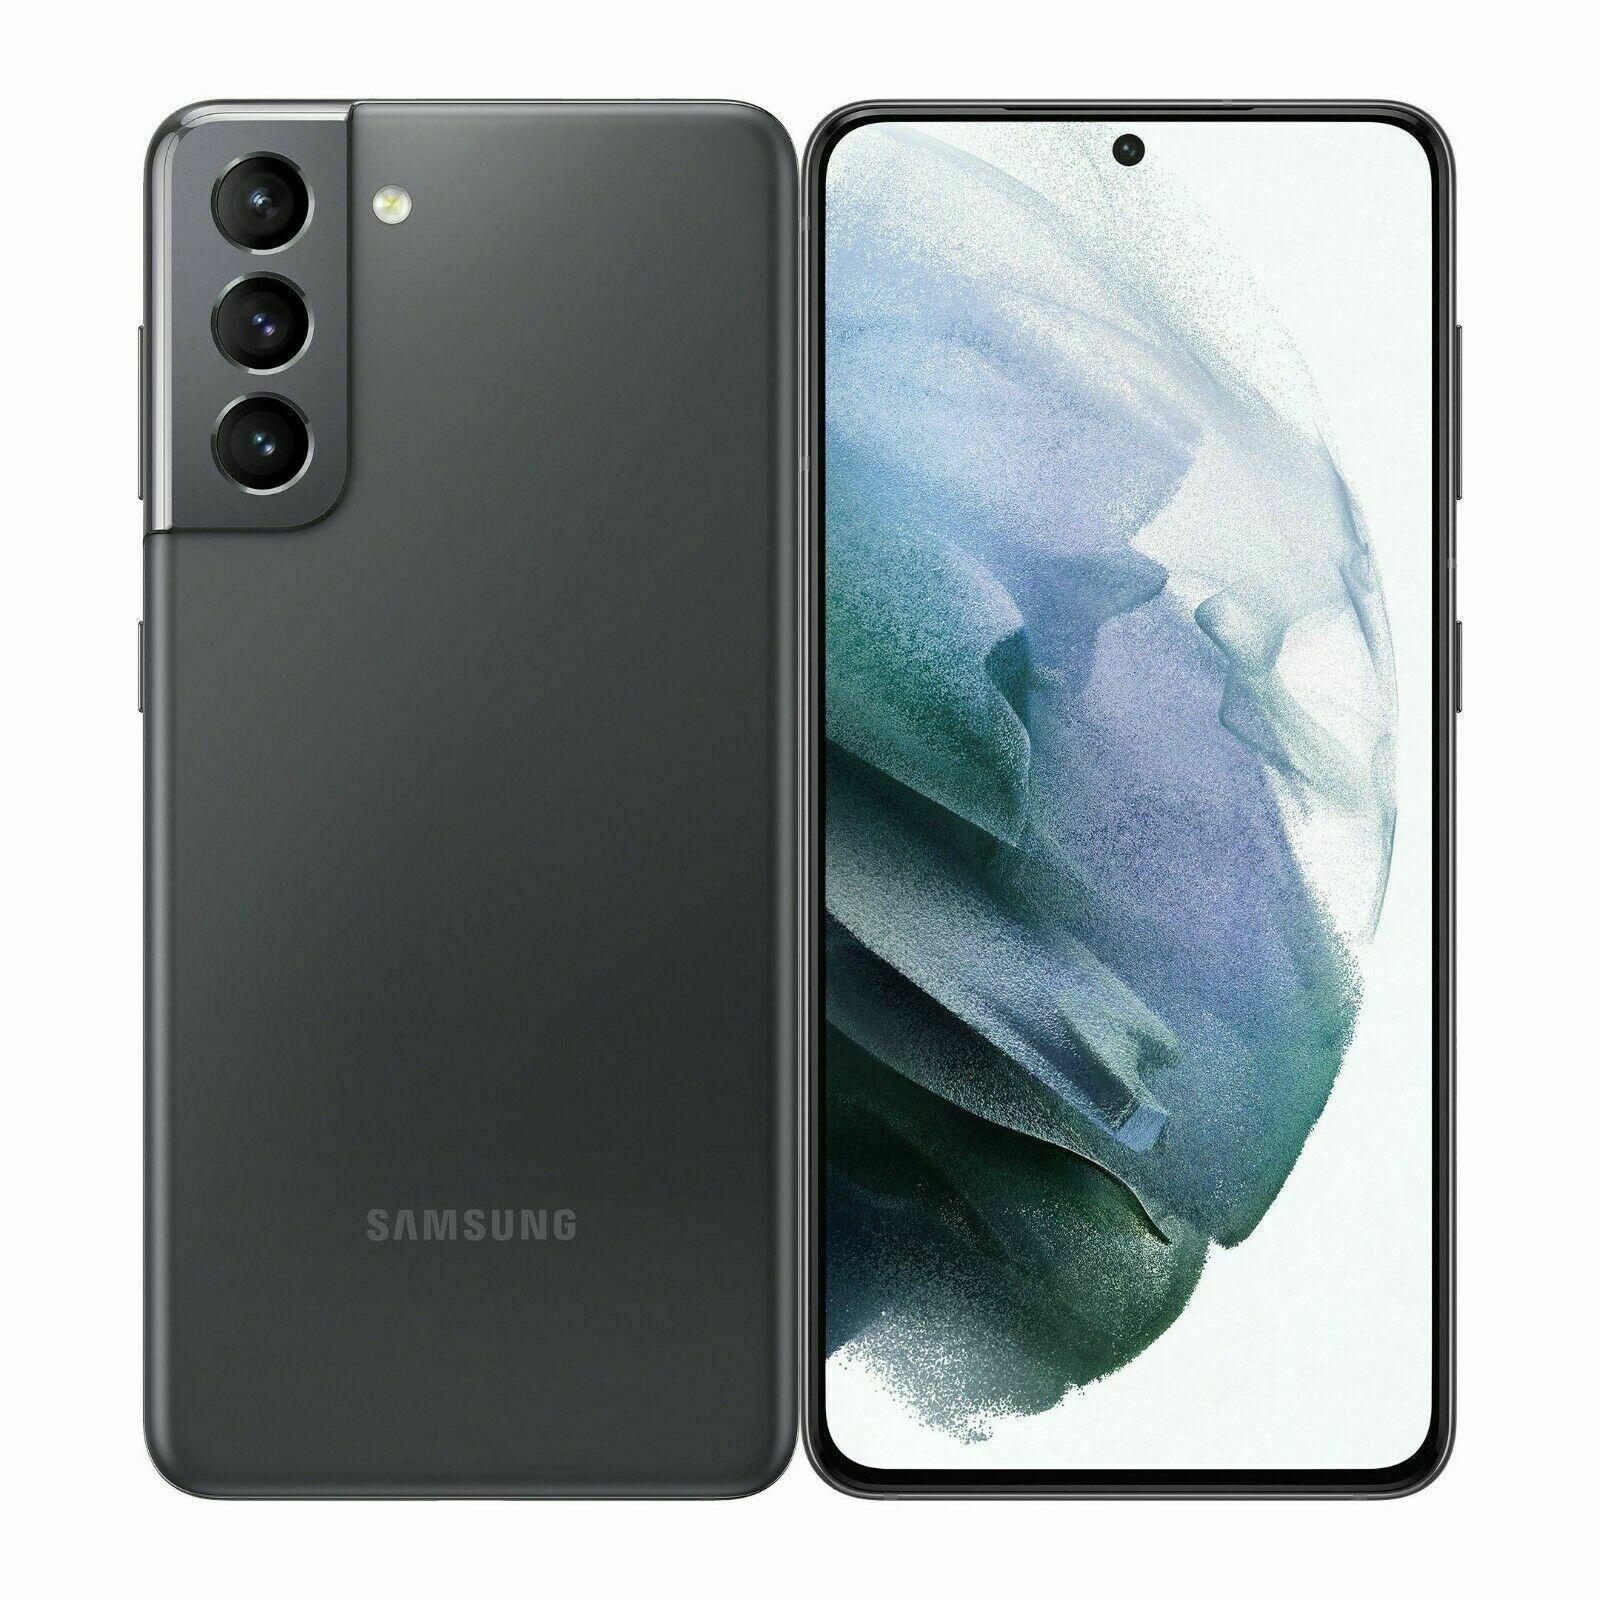 Brand new Samsung Galaxy S21 5G, 120hz HDR10+ AMOLED, 8k video, 8GB RAM, 128GB, Exynos. Unlocked £549.99 (with code) @ eBay / mobiledealsuk